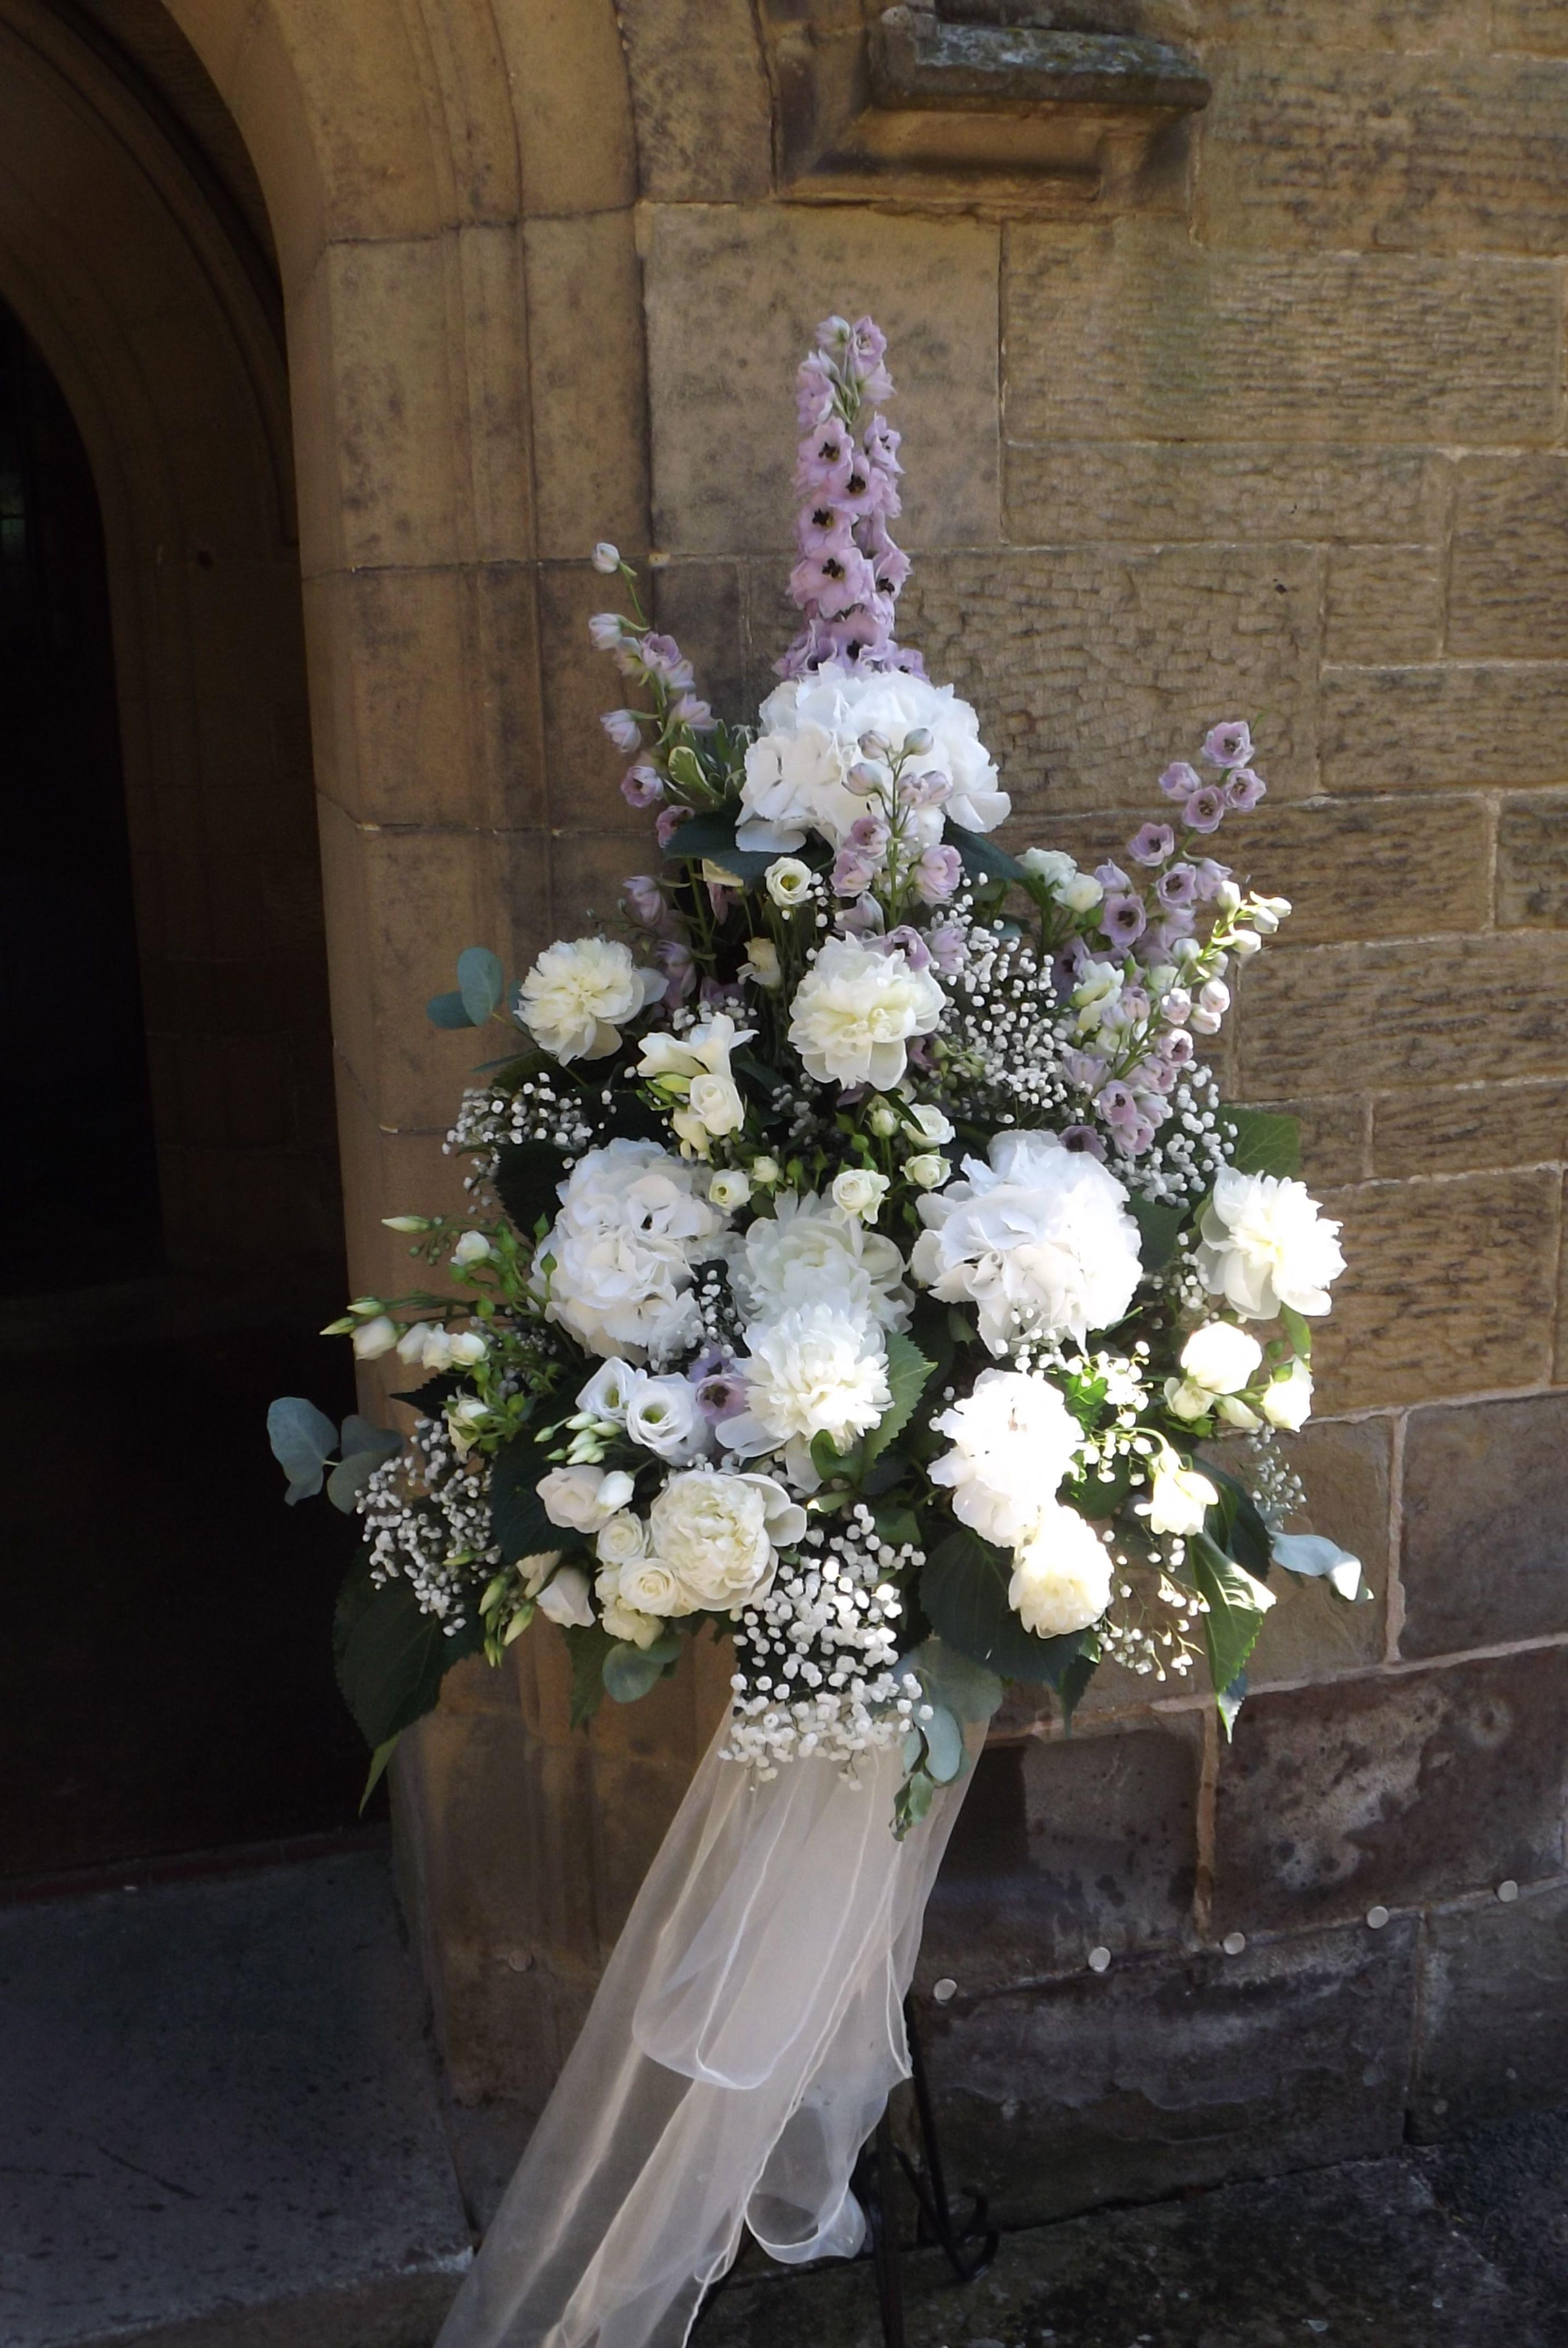 Pin on Church flowers